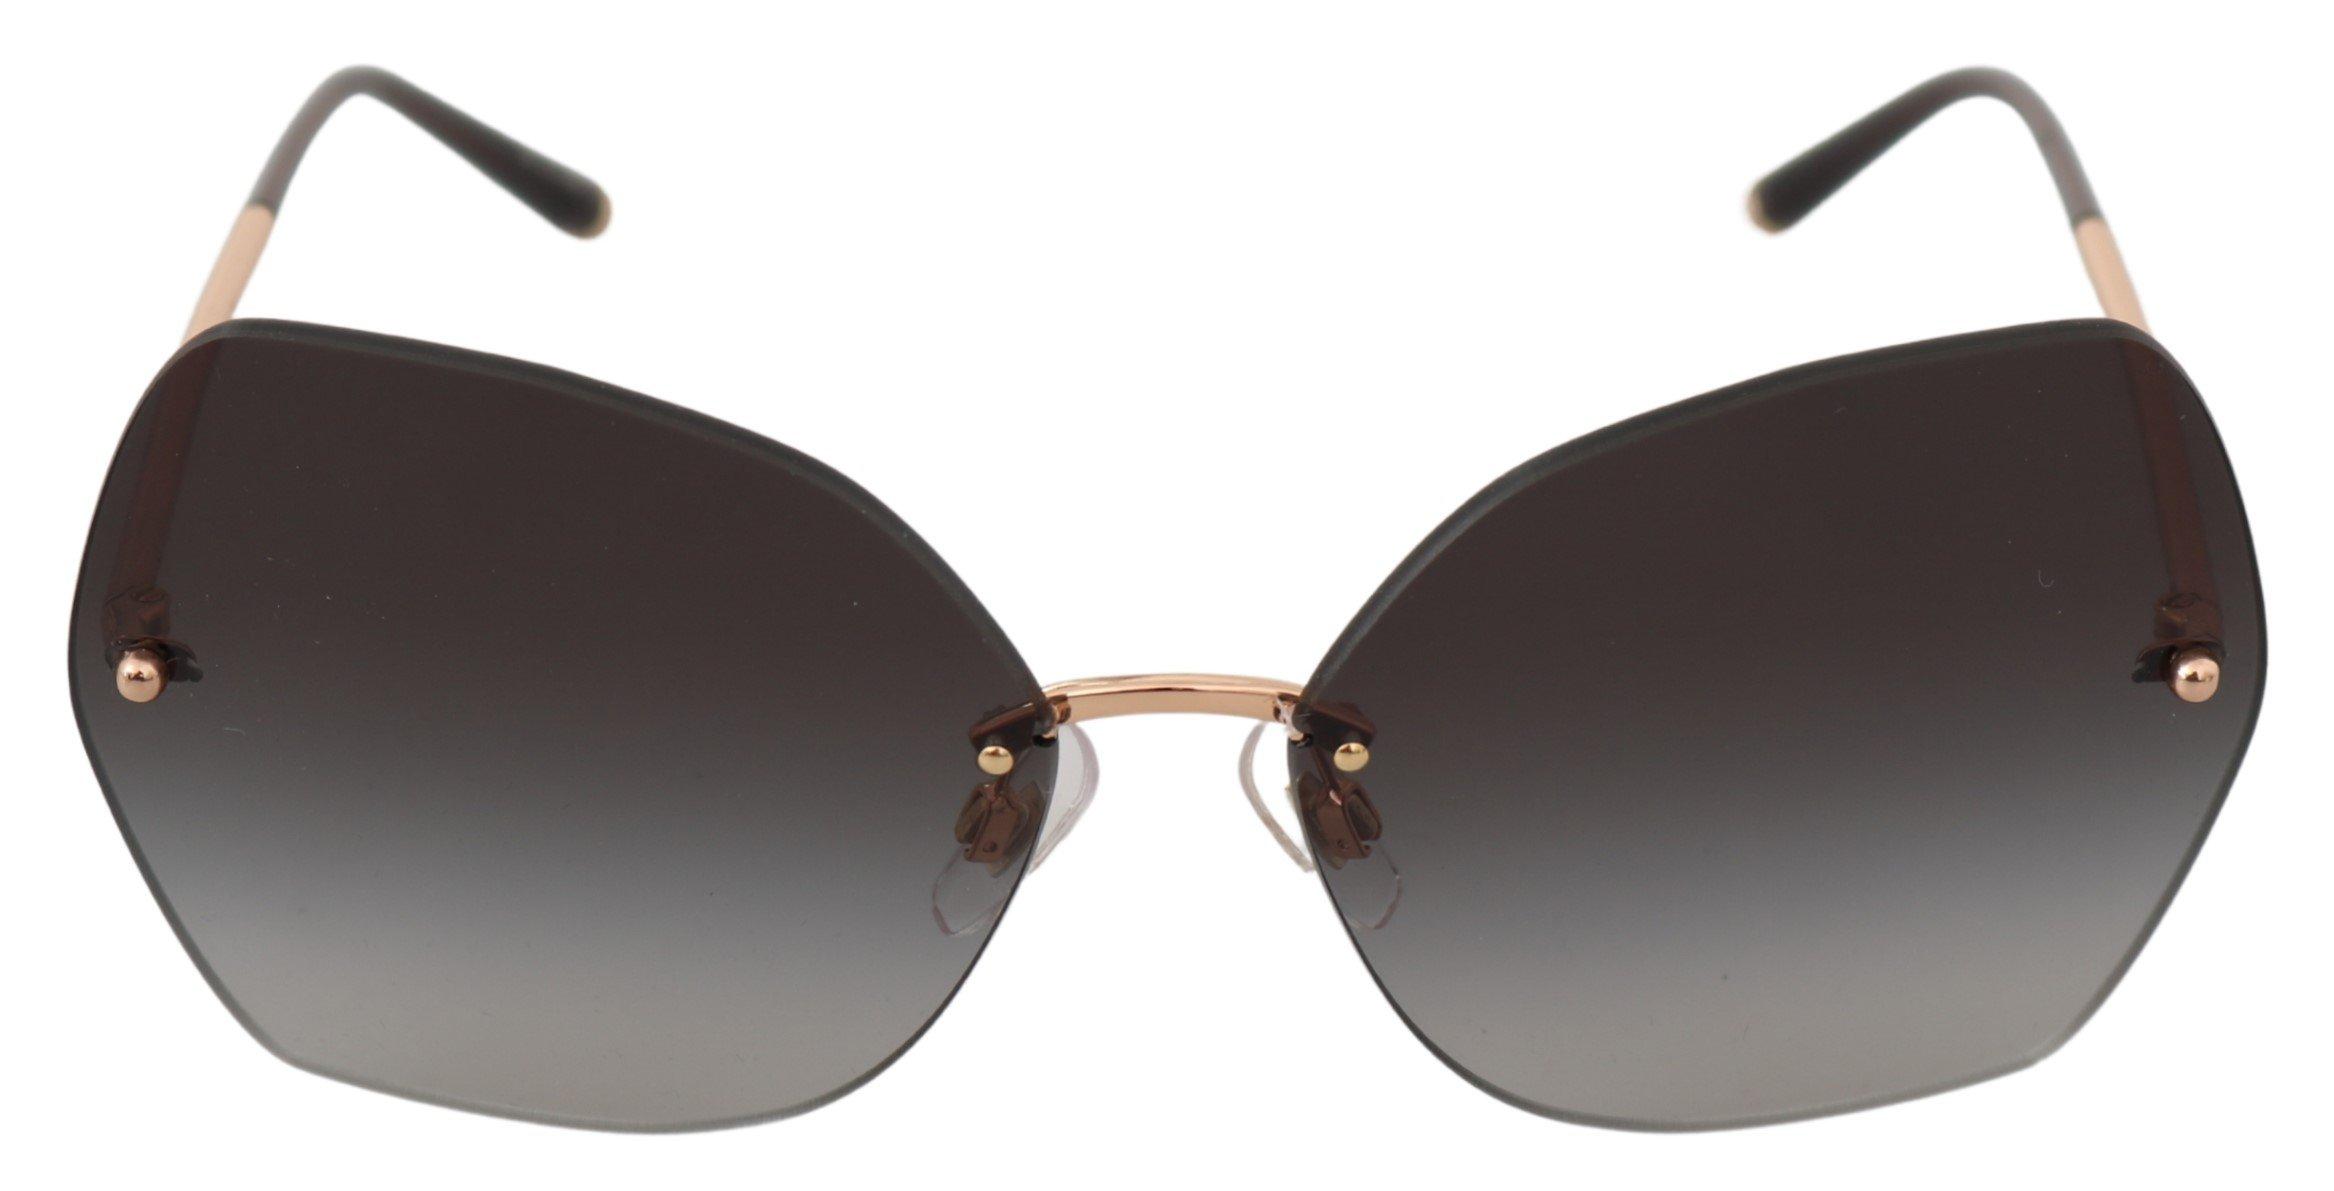 Dolce & Gabbana Women's Butterfly Logo Sunglasses Gray GLA743